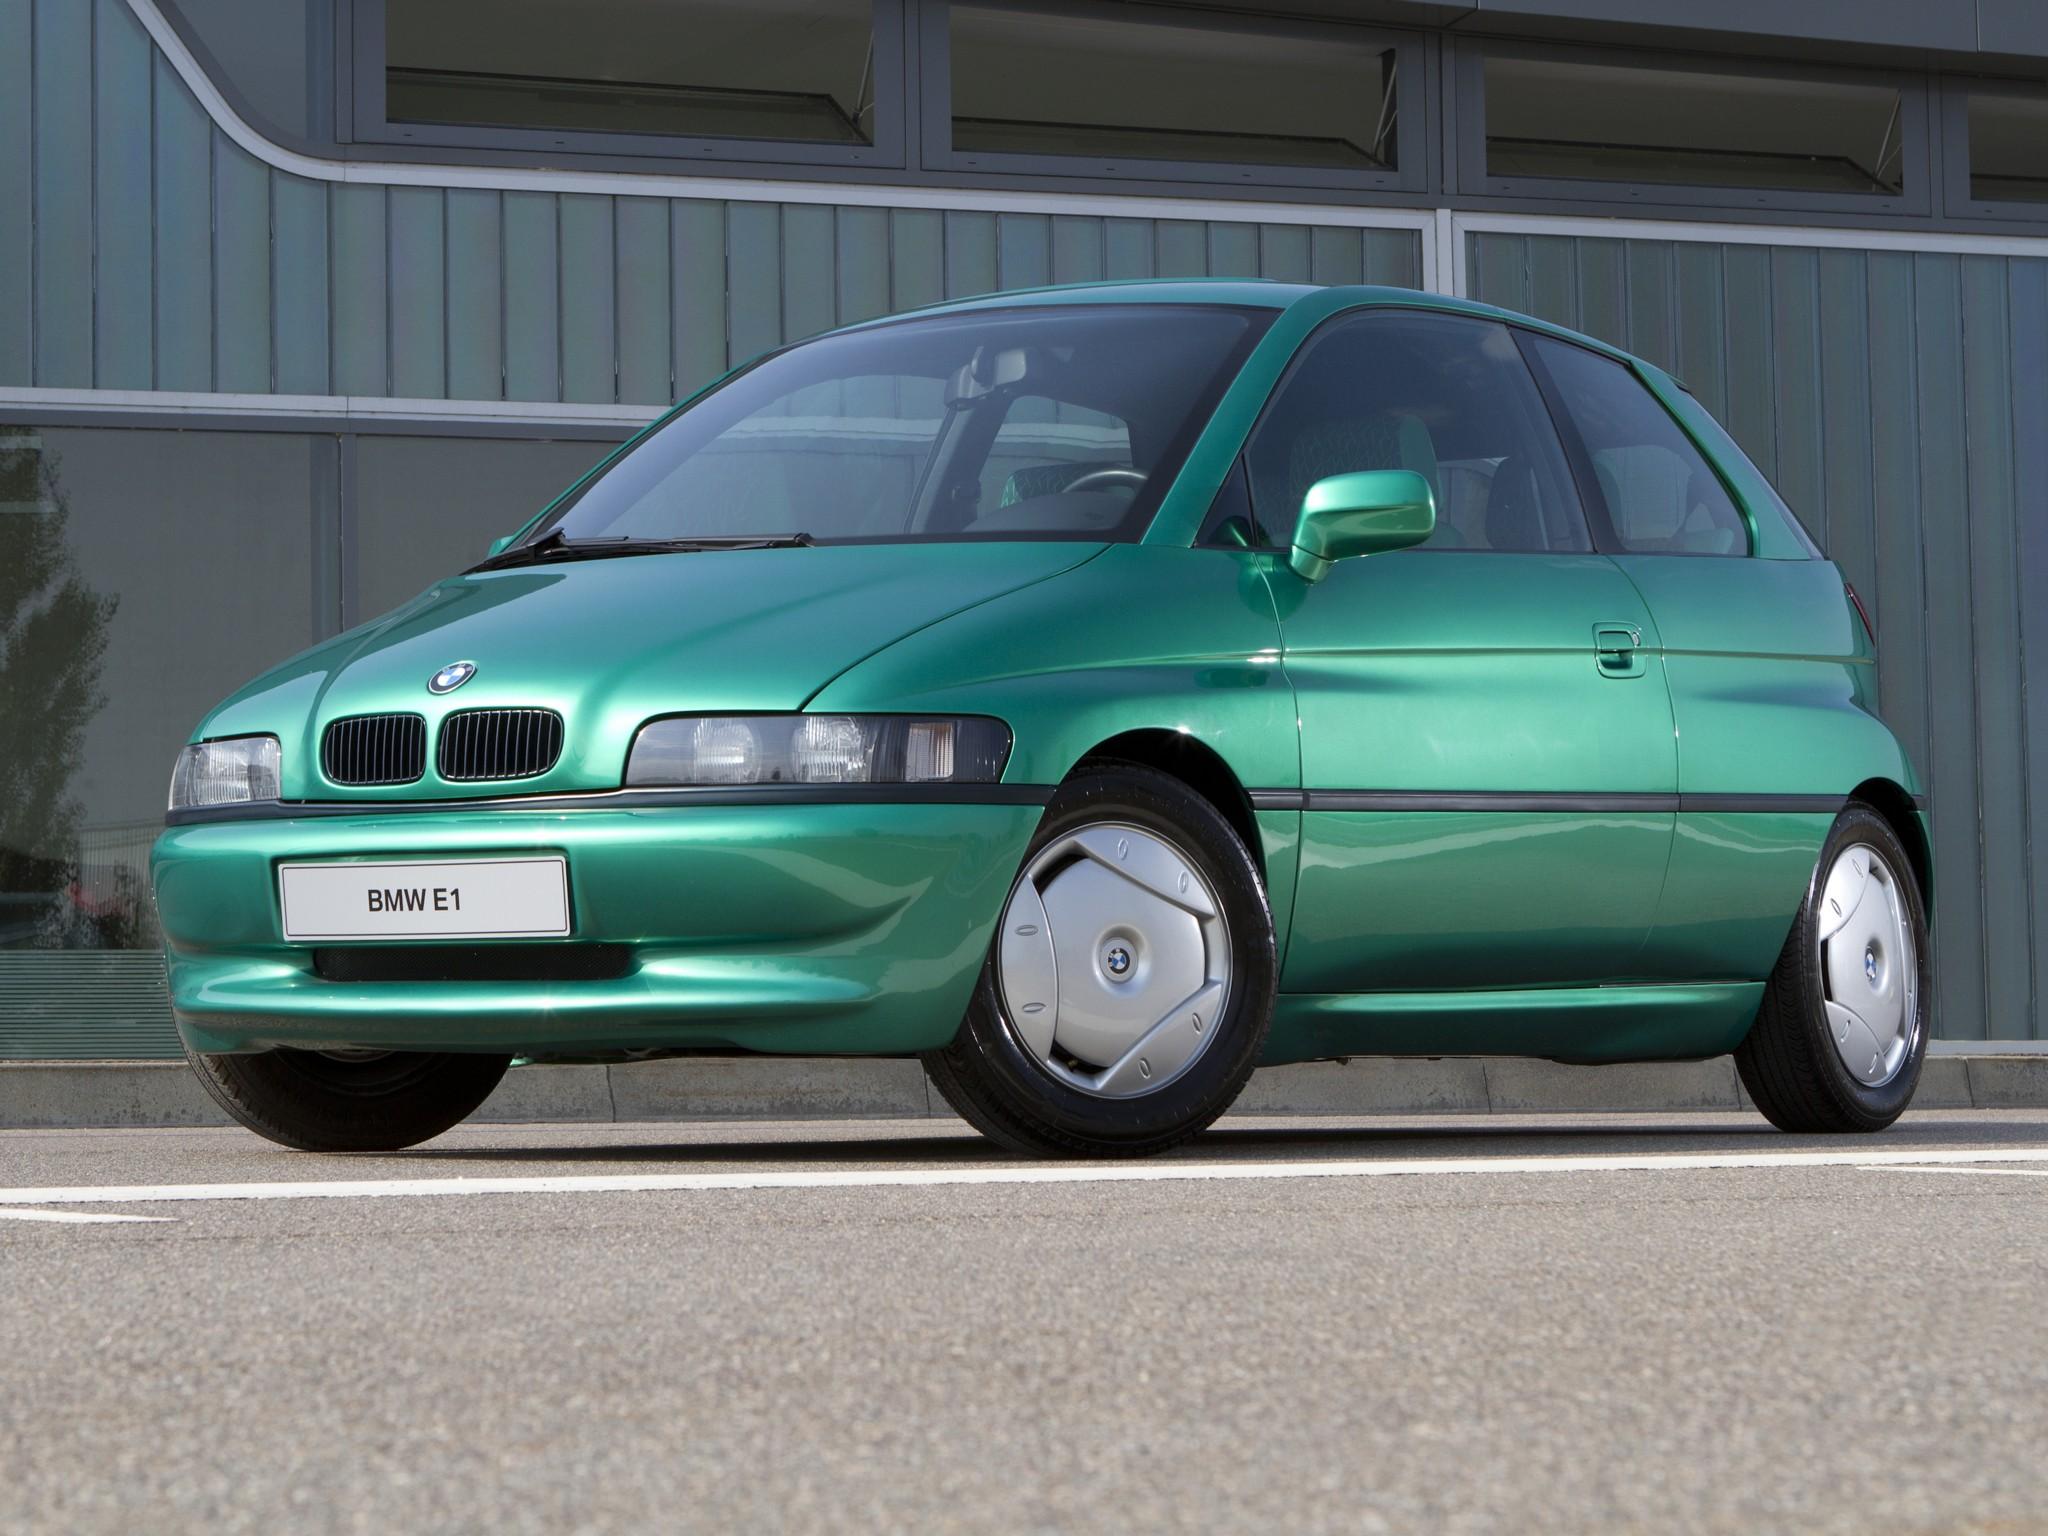 Bmw Z15 E1 1993 Old Concept Cars